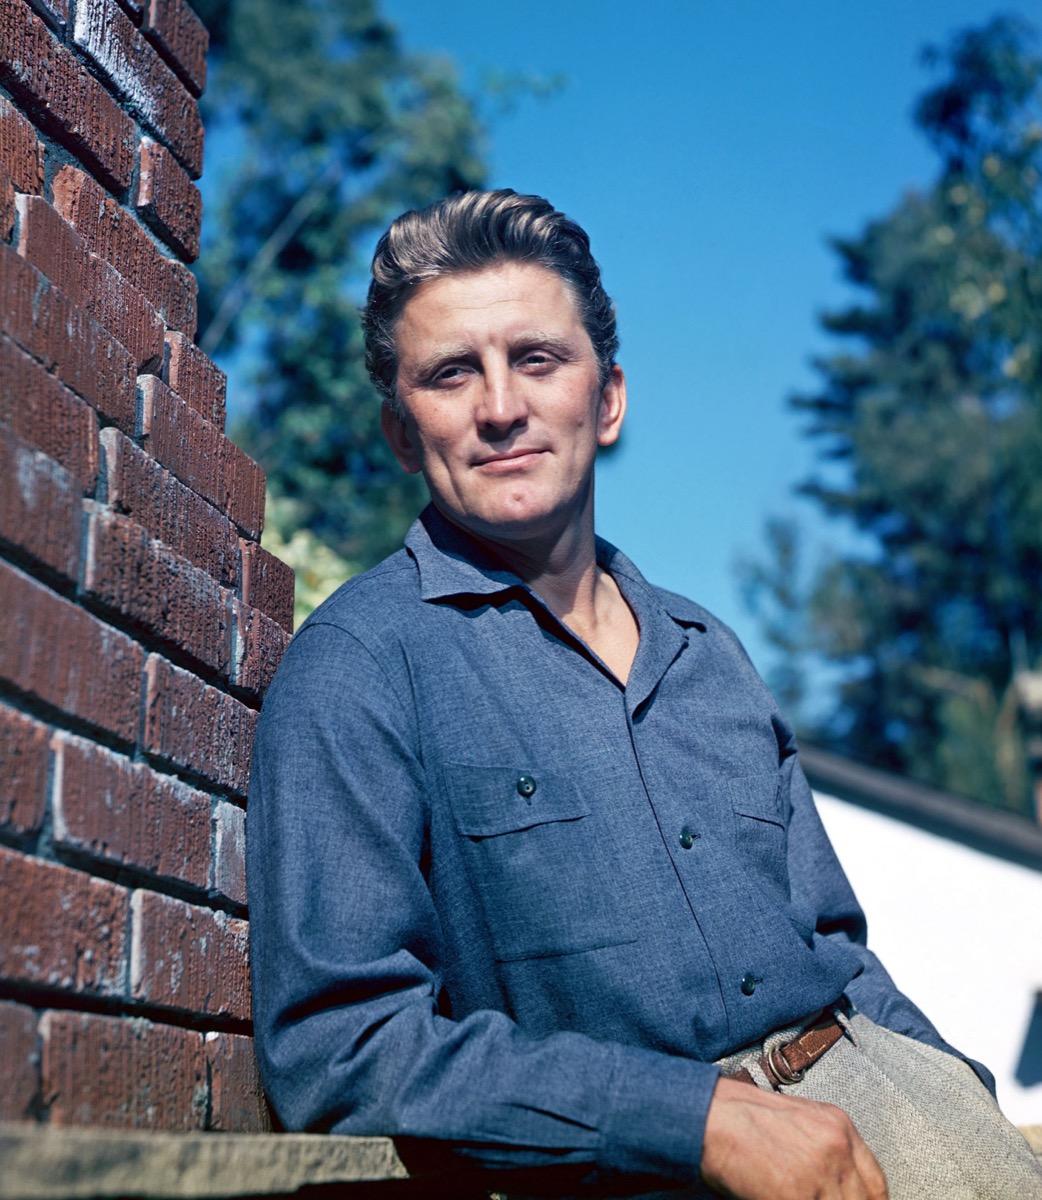 Kirk Douglas in 1950